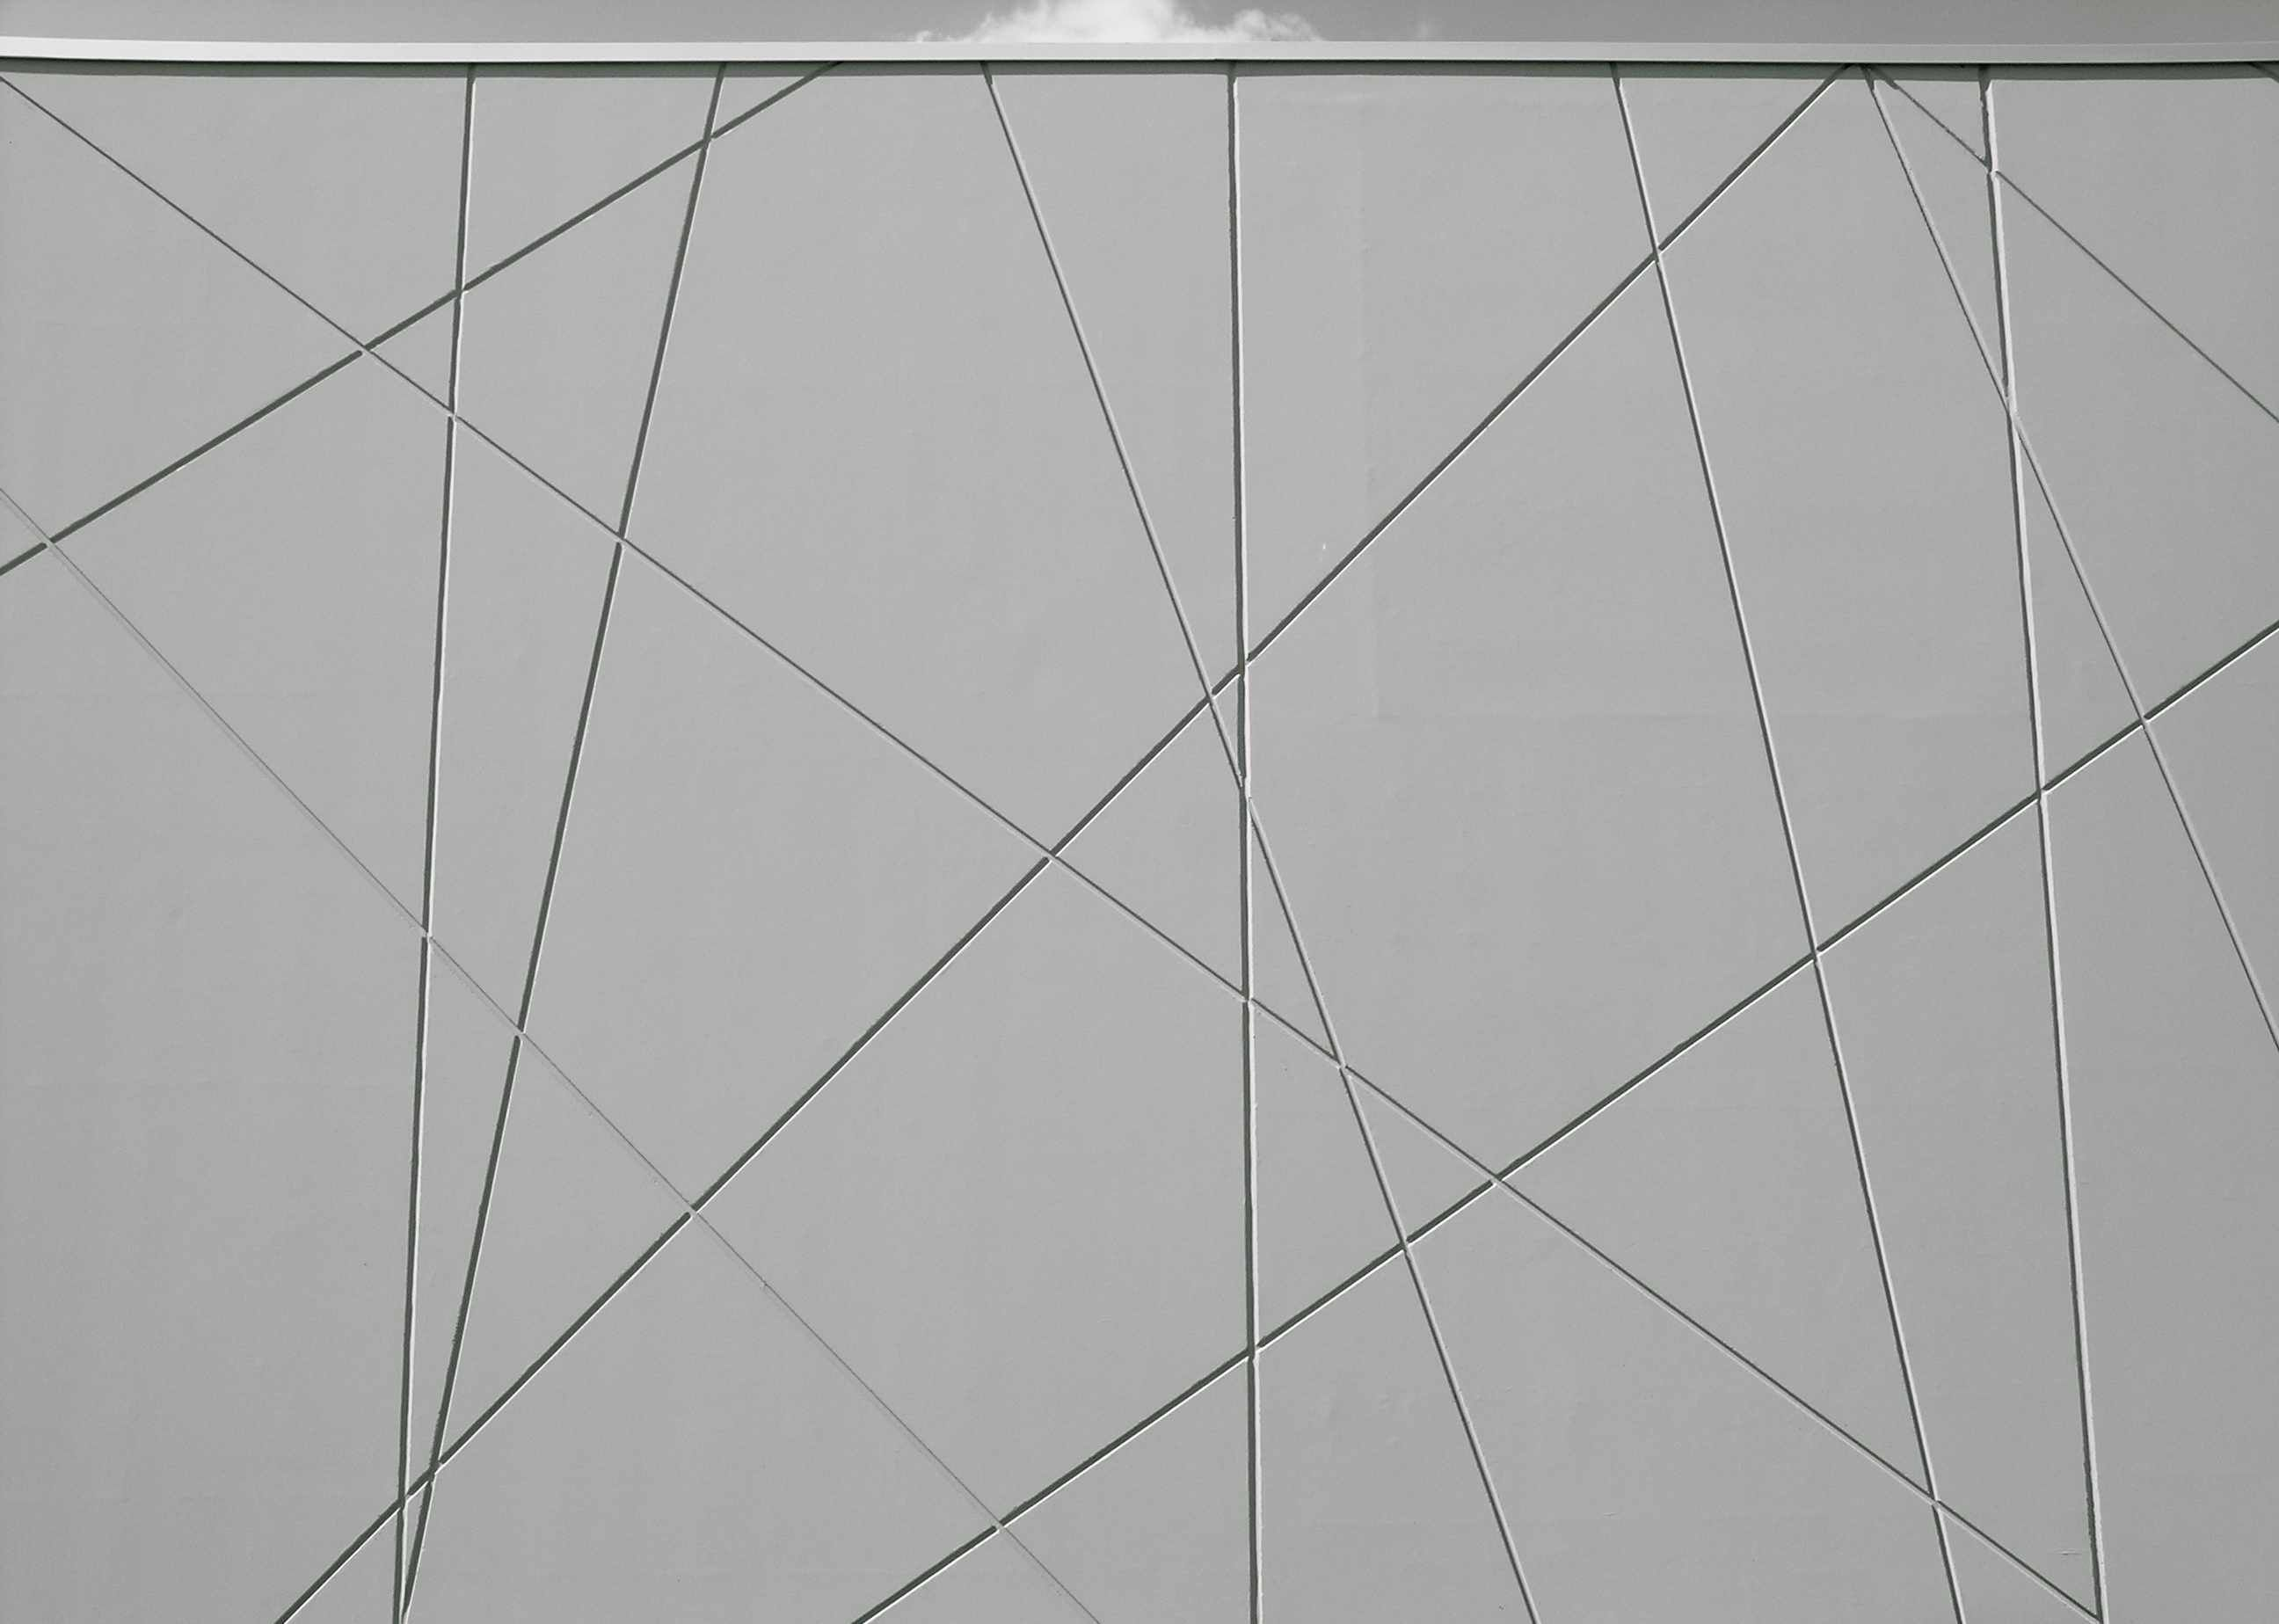 concrete panel wall texture - Google Search | architecture ...